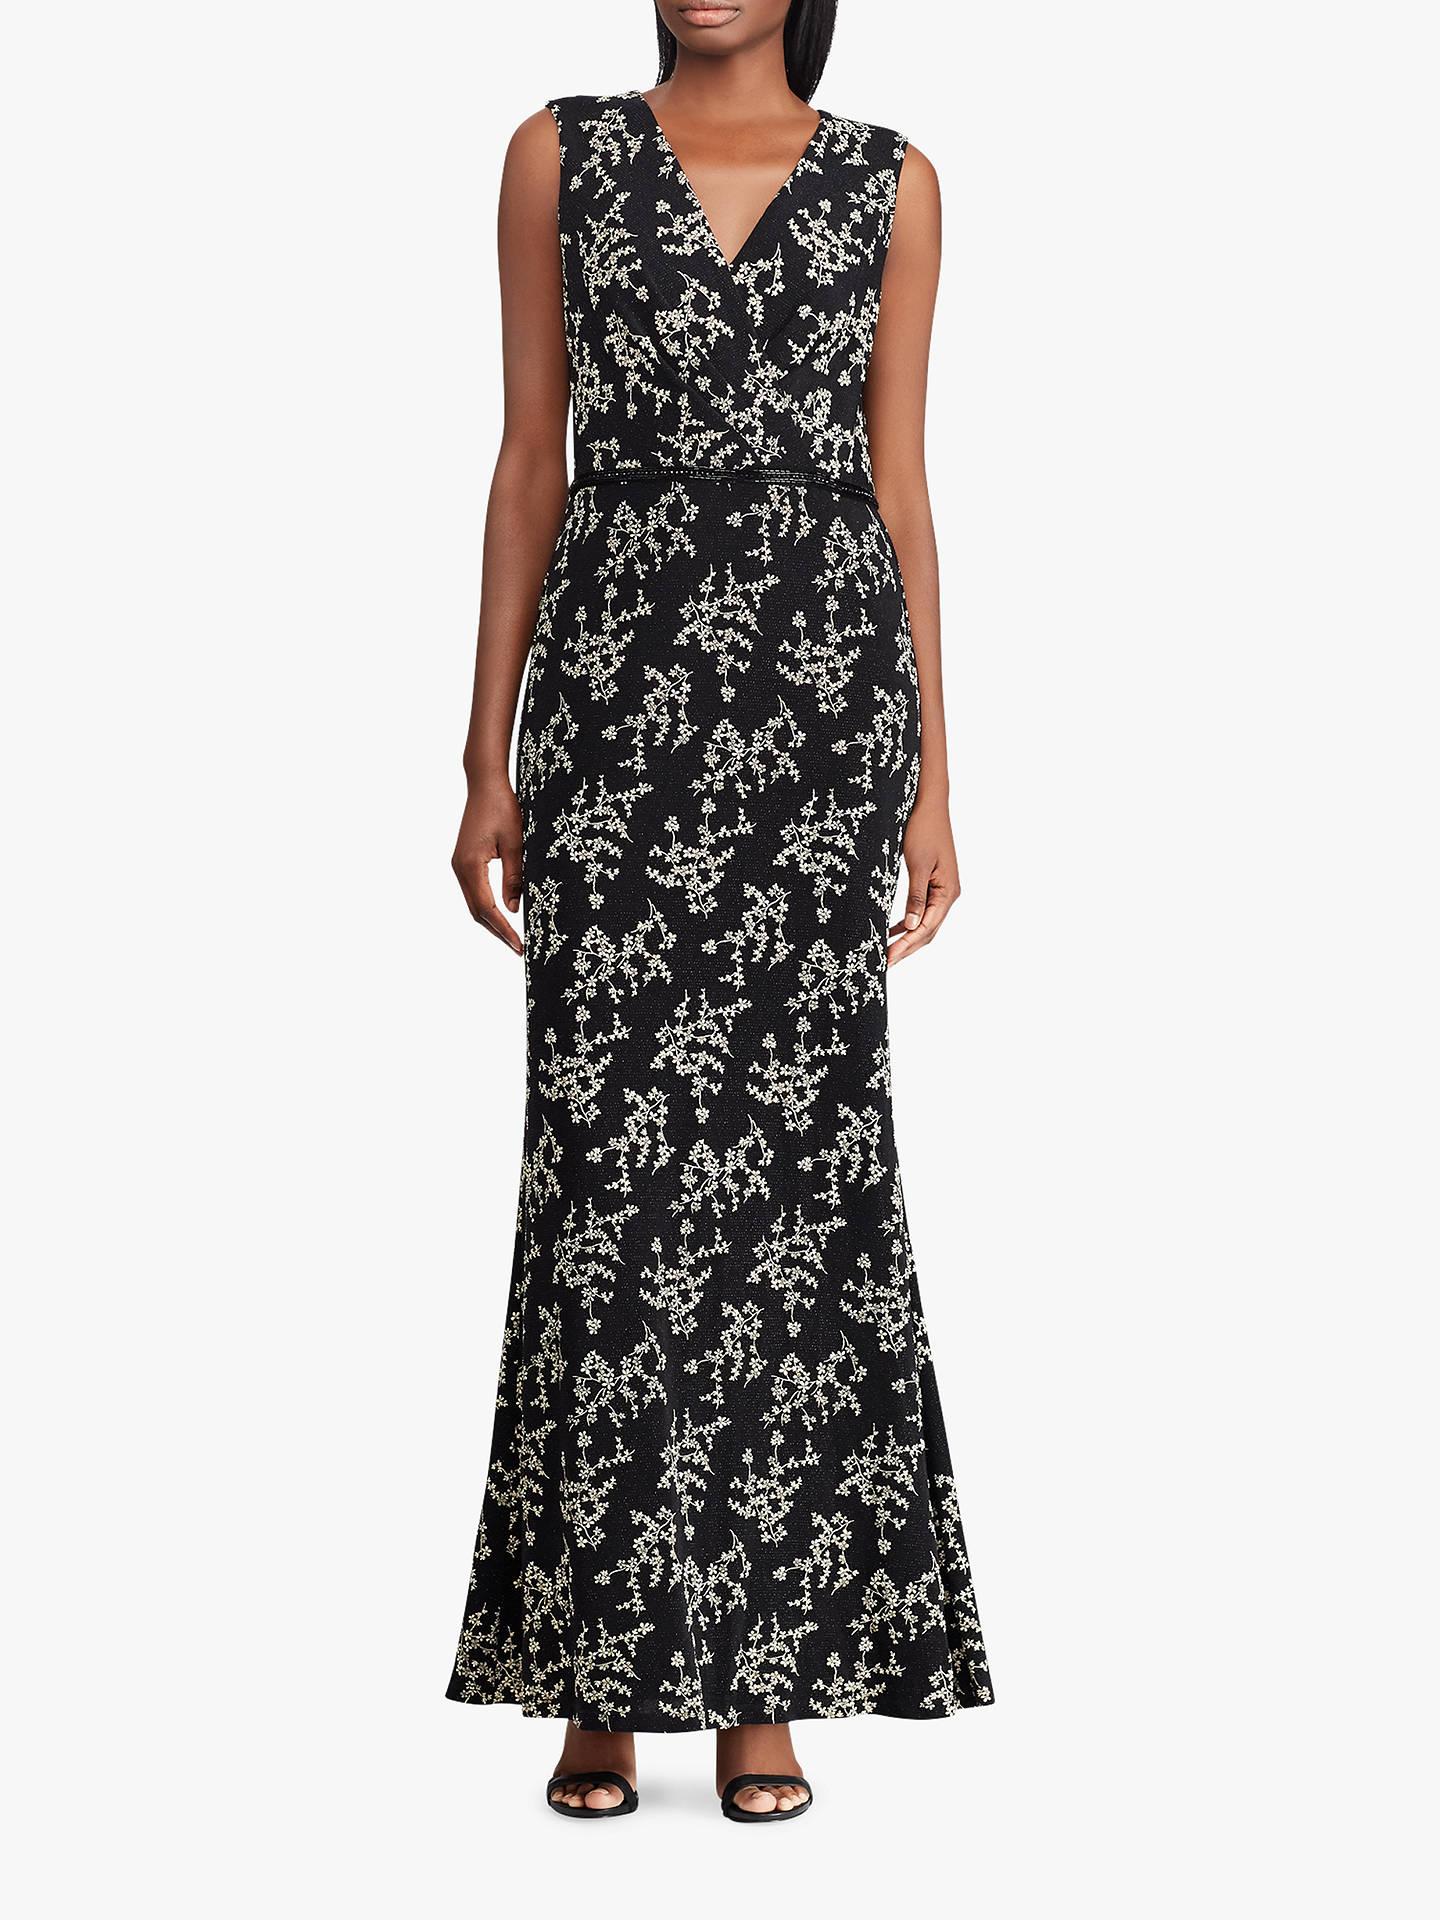 915f4bcf6c BuyLauren Ralph Lauren Rozana Dress